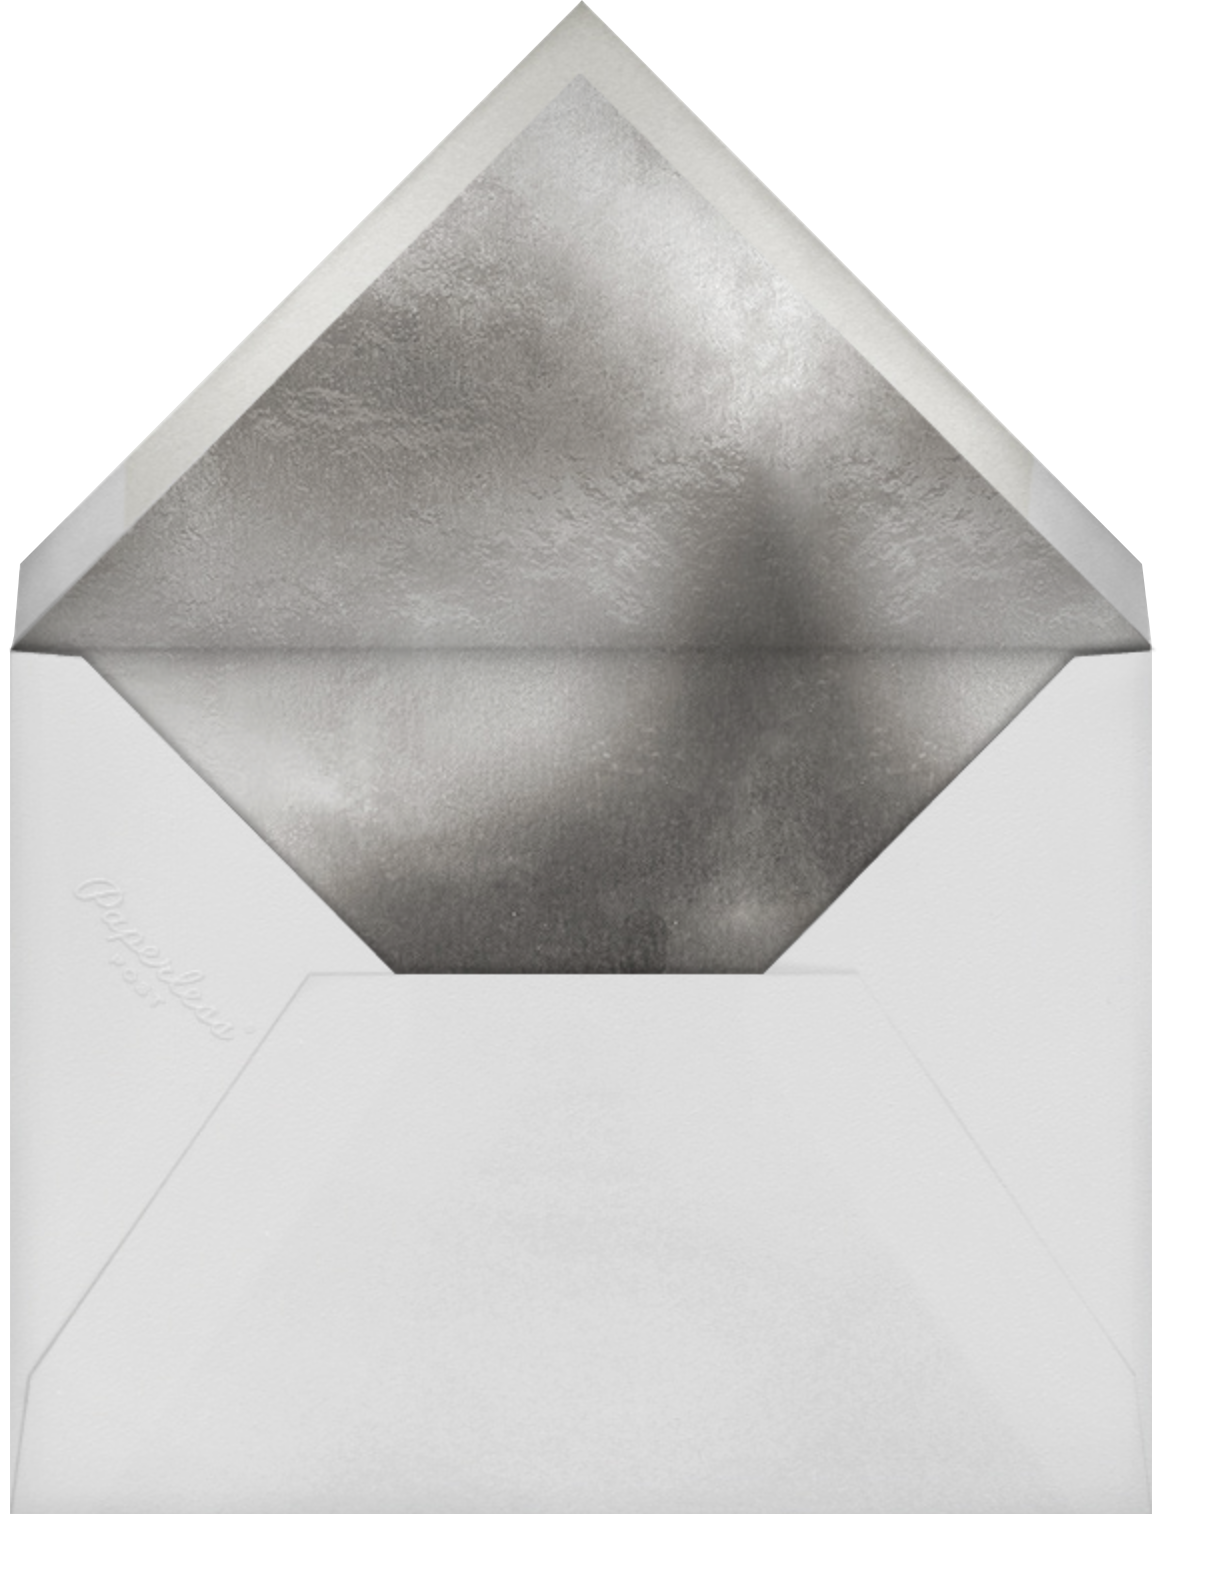 Fillet - Santa Fe (Invitation) - Paperless Post - All - envelope back